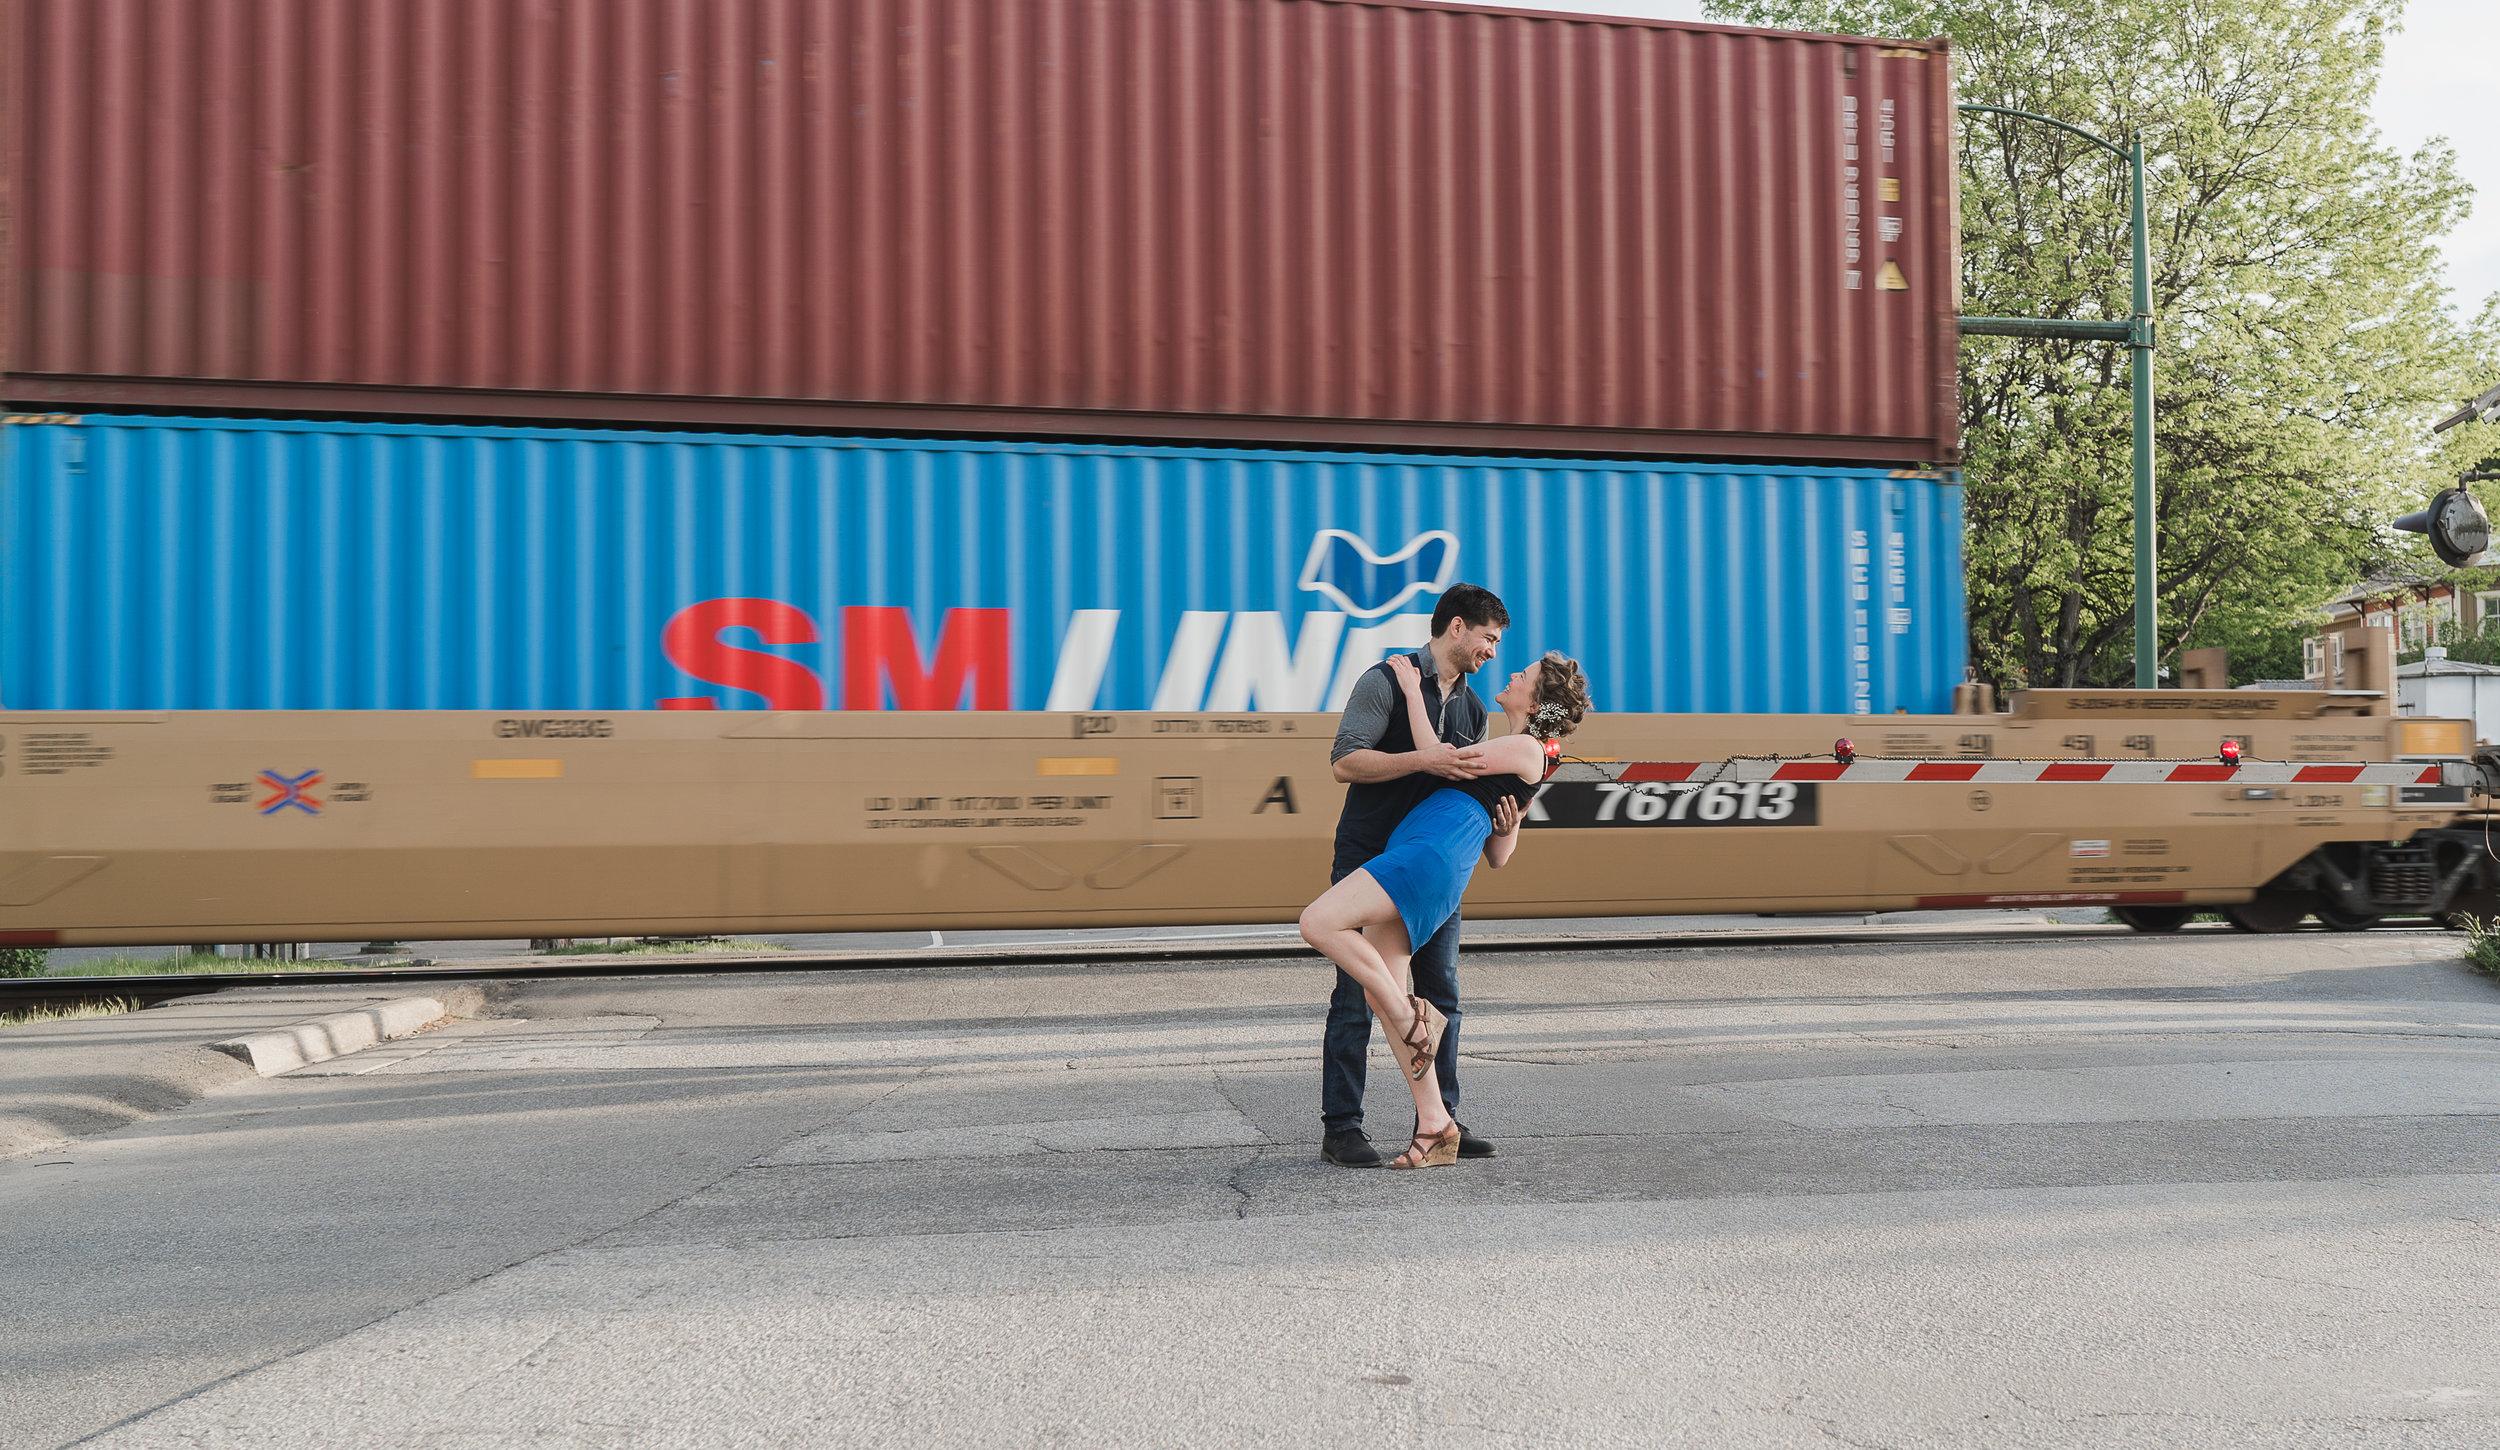 20190511 - Nicola & James Engagement- 0121.jpg